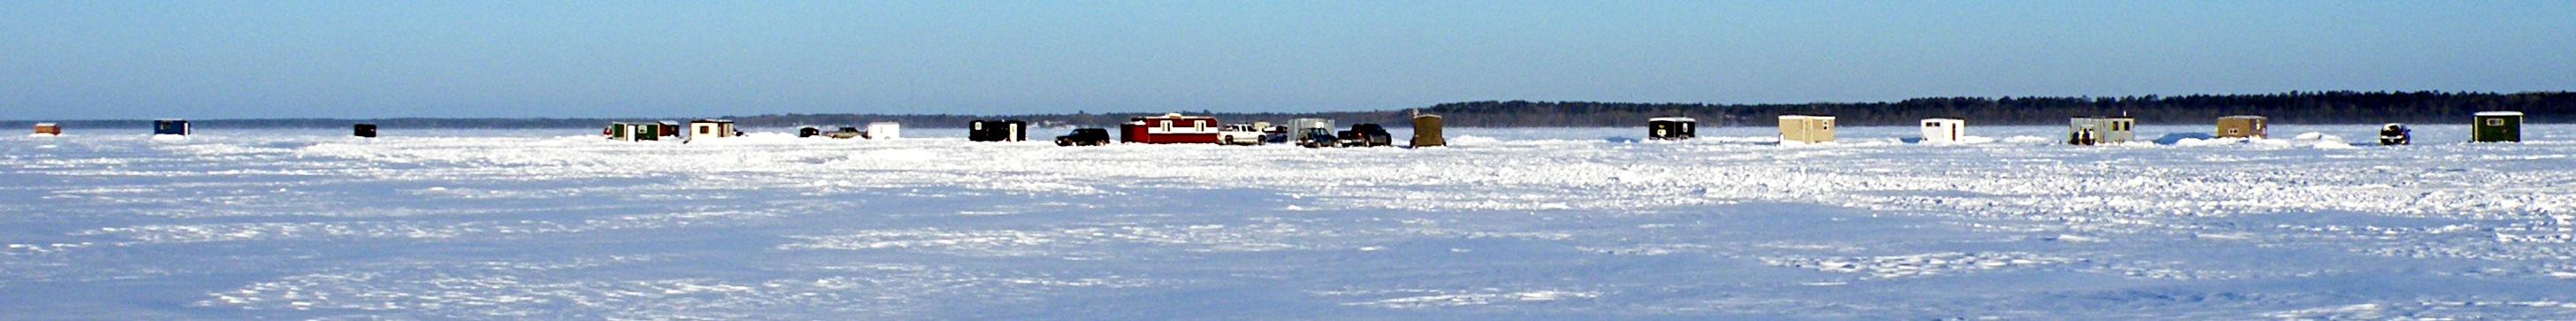 Ice fishing houses on Lake Bemidji in Minnesota (2008) Photo by Matthew Stinar - CC BY-2.0